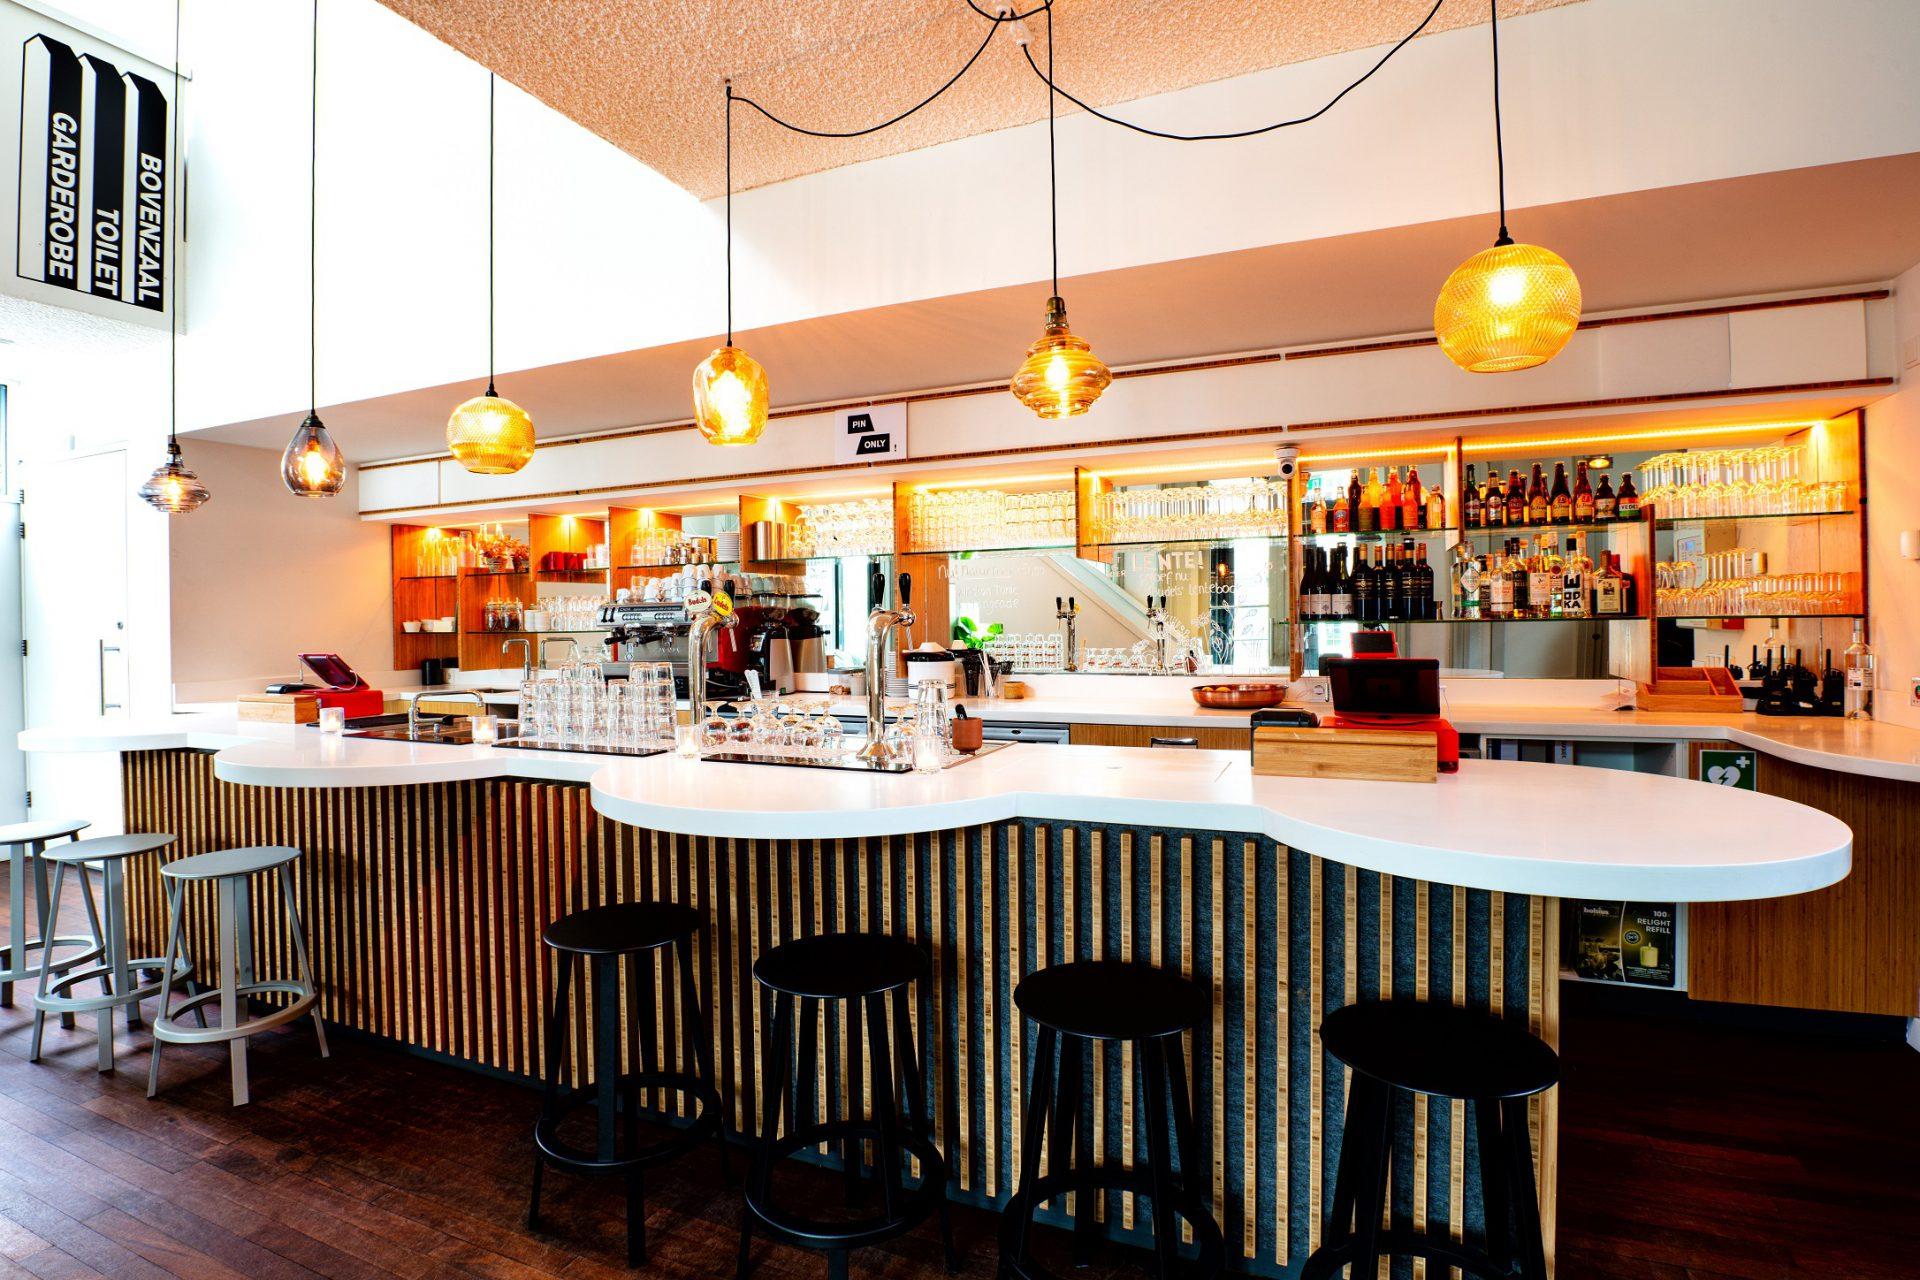 Café & foyer Theater a/d Rijn - foto Menno van der Meulen